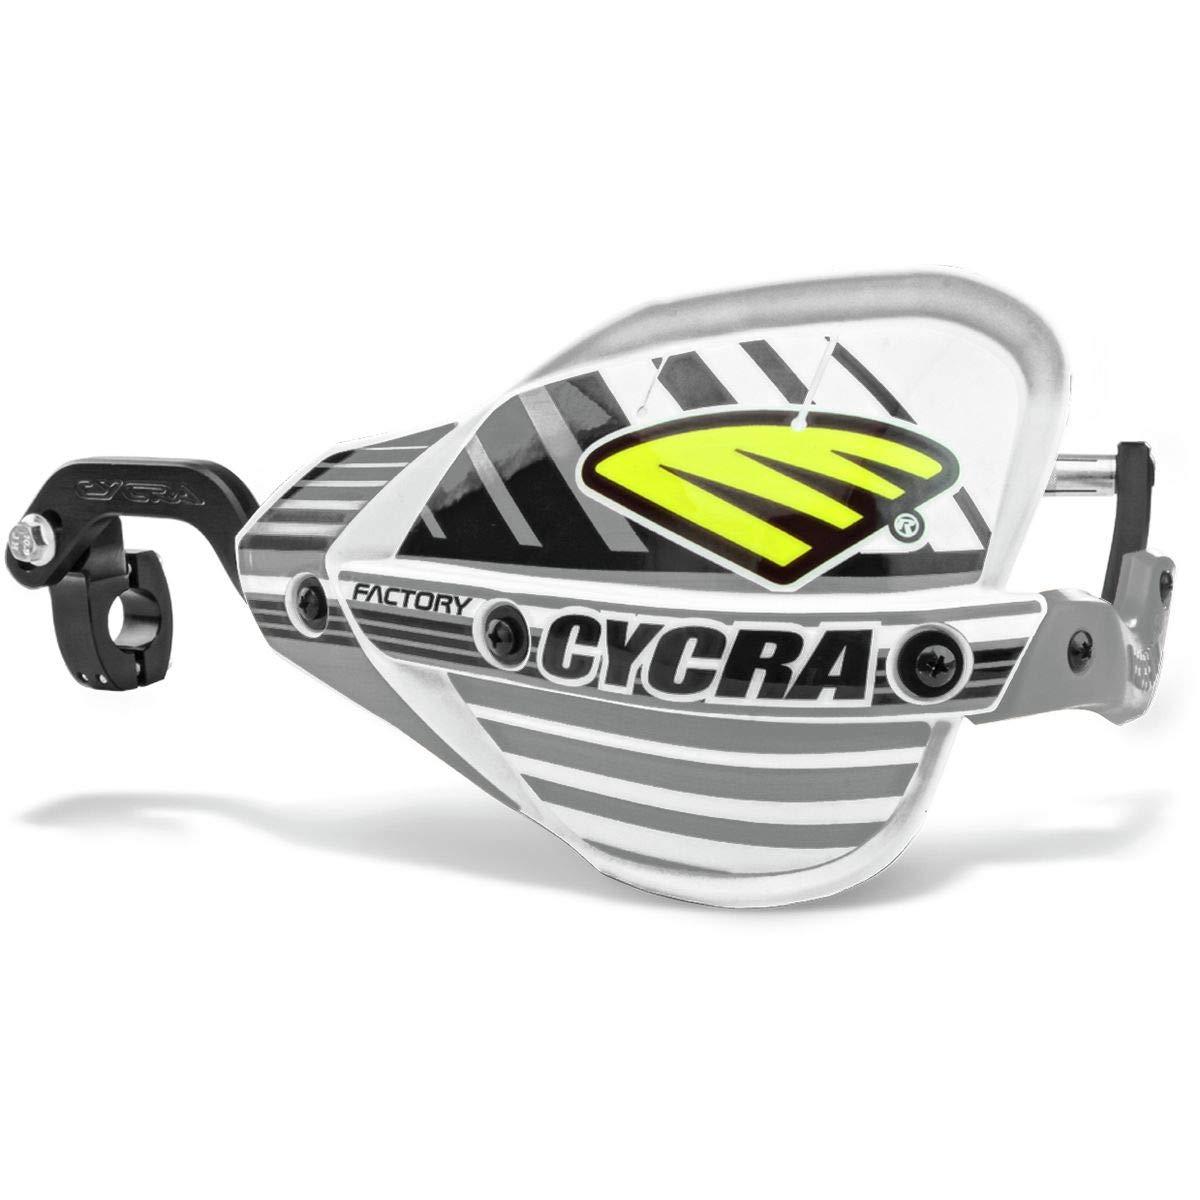 Oversize 1-1//8 Bars Orange Cycra Factory CRM Pro Bend Racer Kit